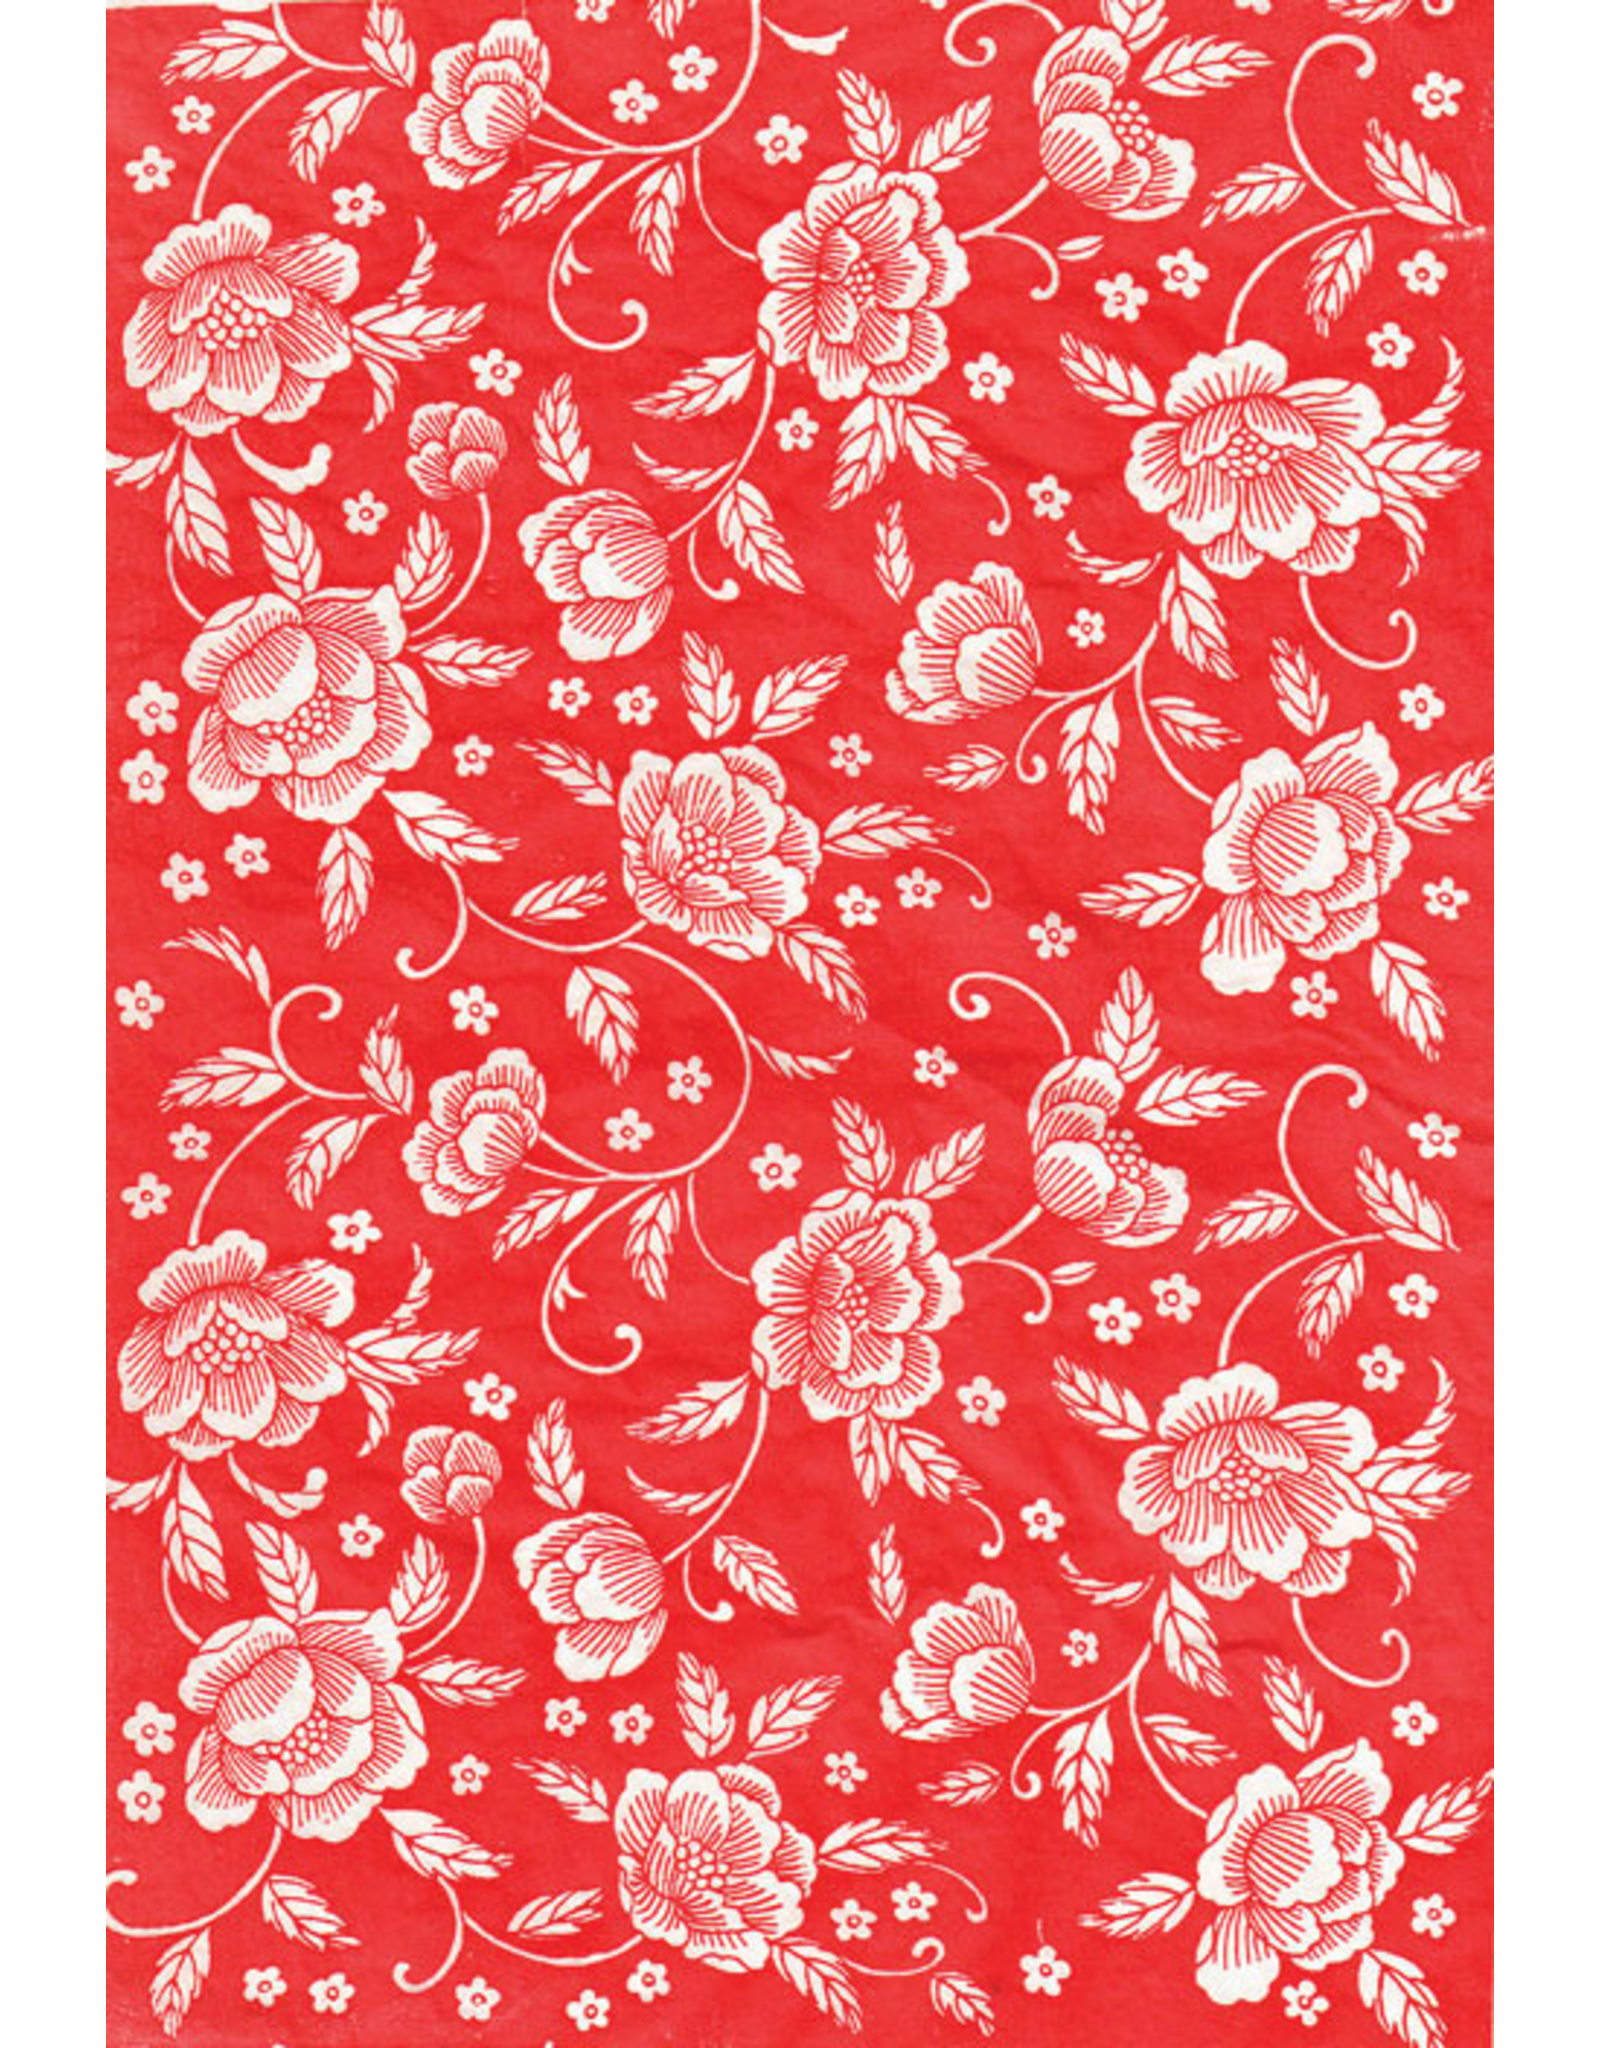 Sanbao Flower decal 02